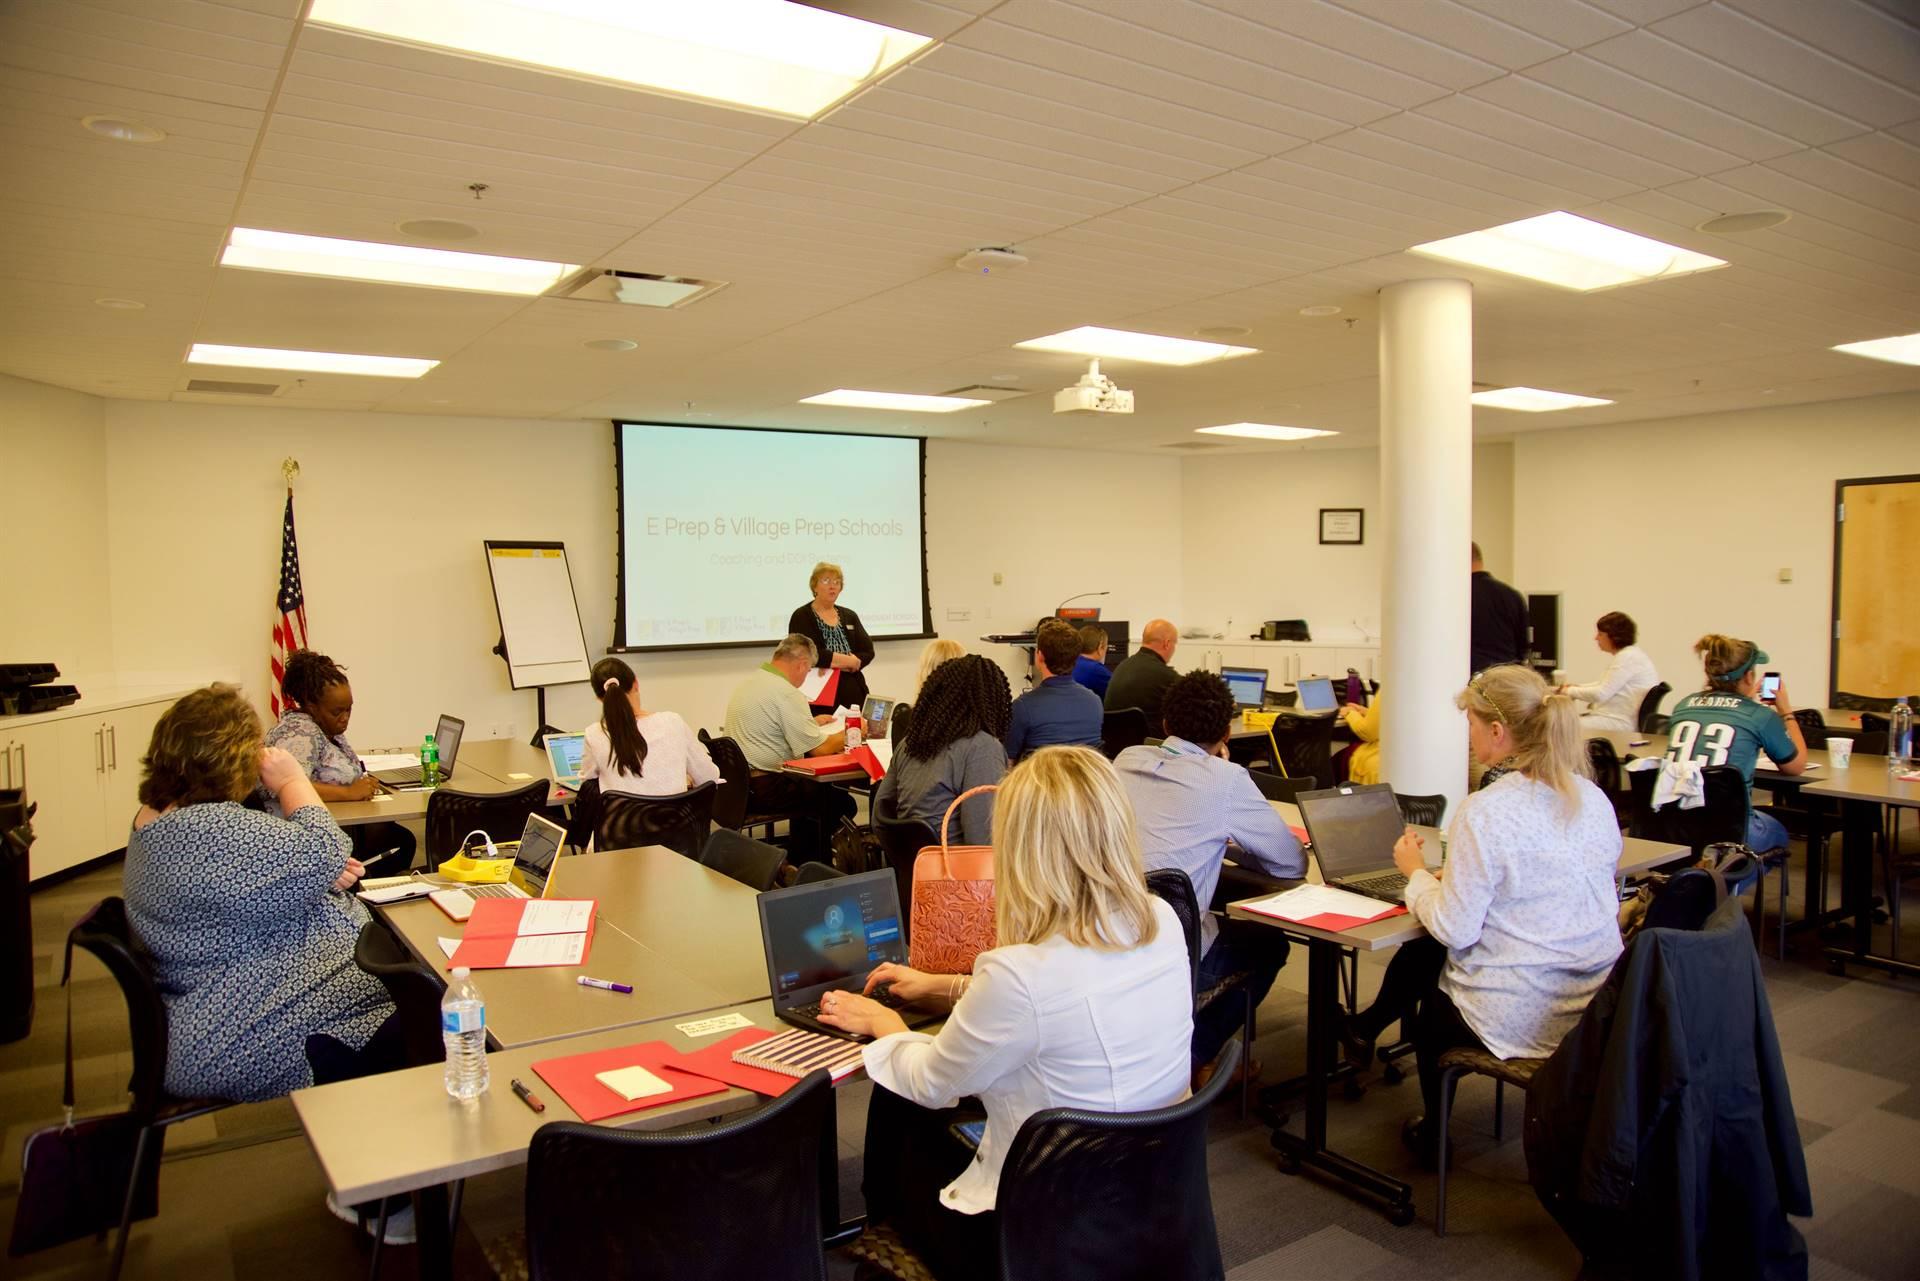 Leadership Network for Community Schools